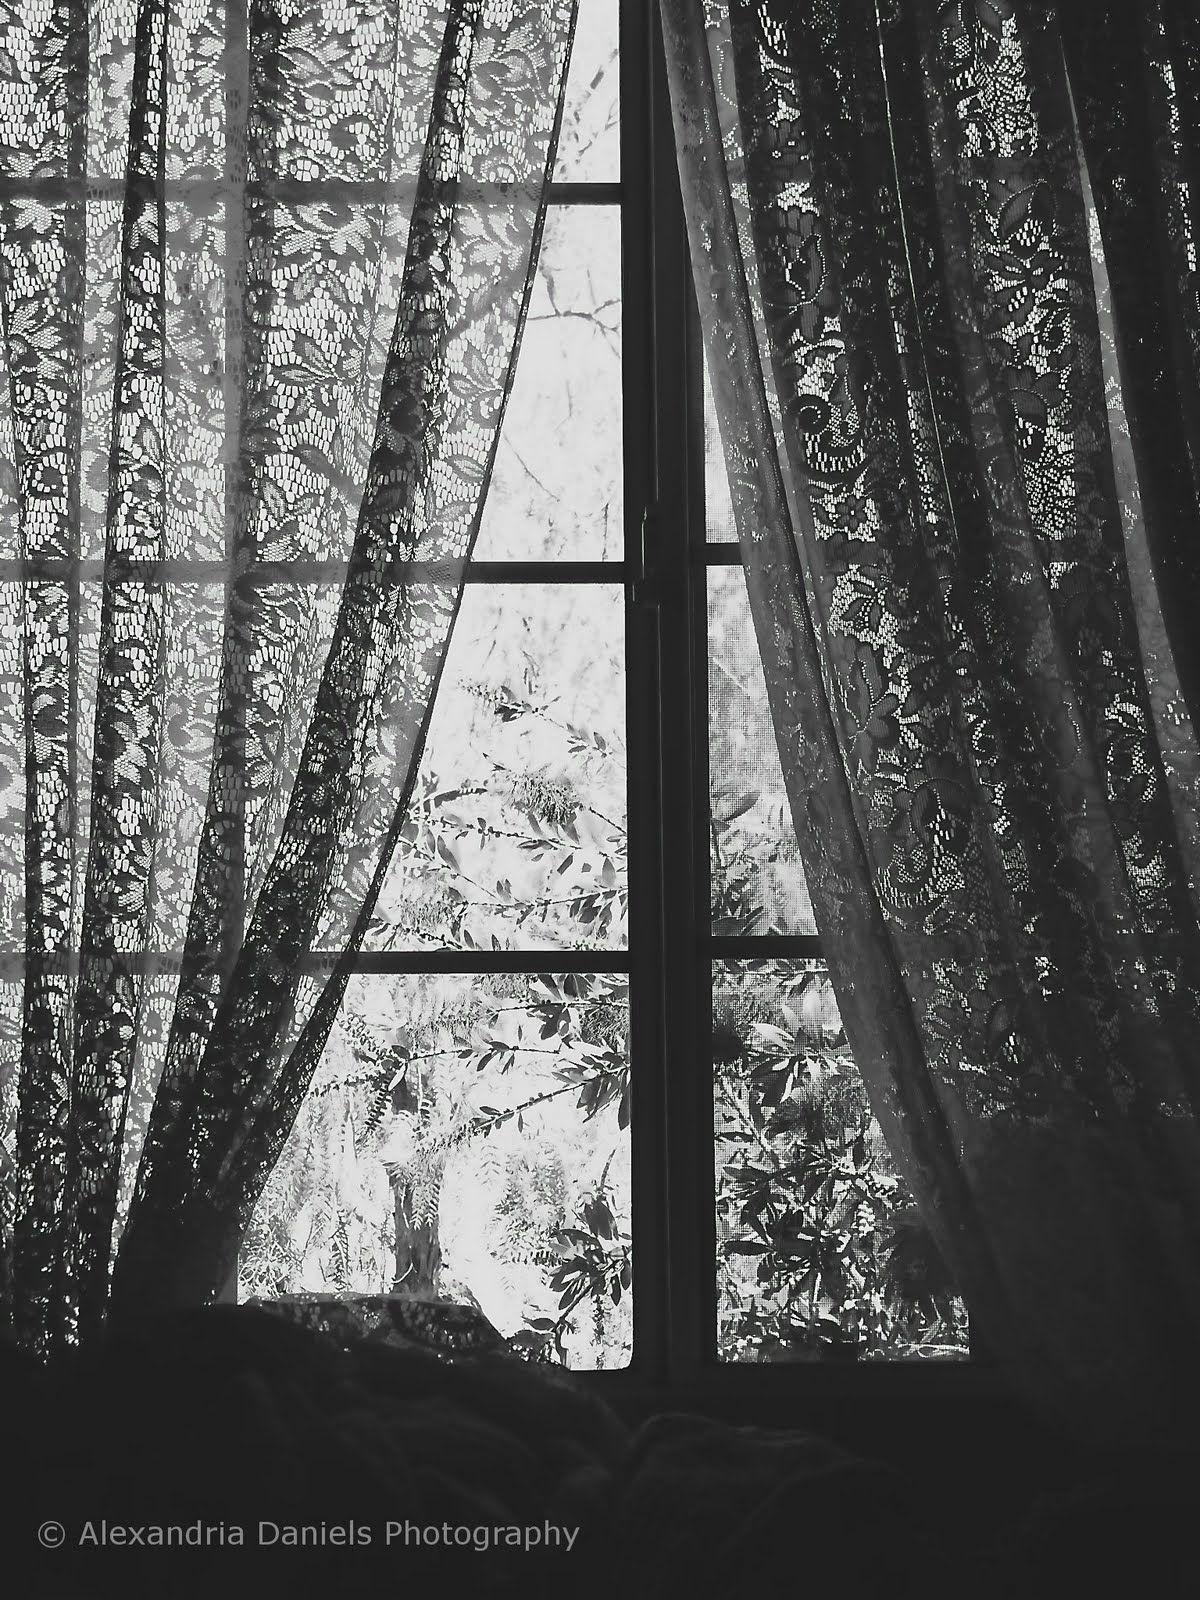 Black Lace Curtains Remind Me Of Stevie Nicks Xoxo CurtainsValanceBlack White HalloweenLiving Room